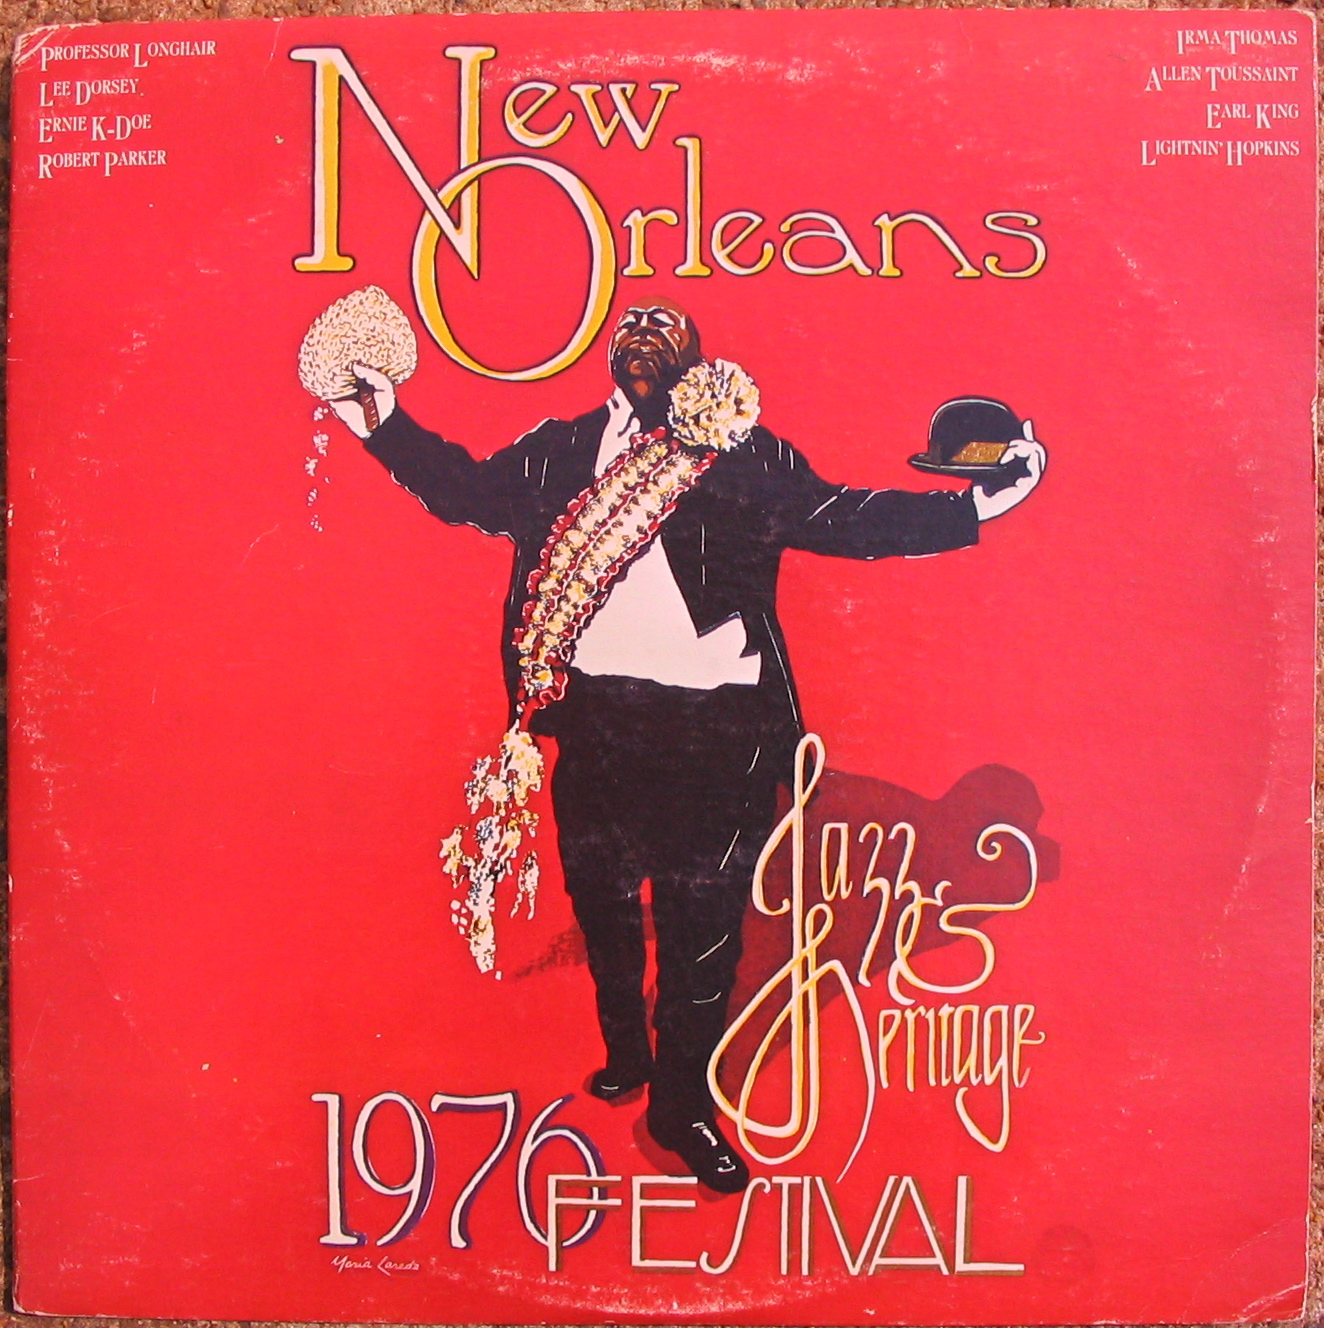 http://2.bp.blogspot.com/-eNNCX1k6VZw/T2s2JFy0aMI/AAAAAAAAIRk/RToJs2Wzn1c/s1600/neworleans_heritage_craft_festival_USA_usevents_art_drawings_cook_music.jpg